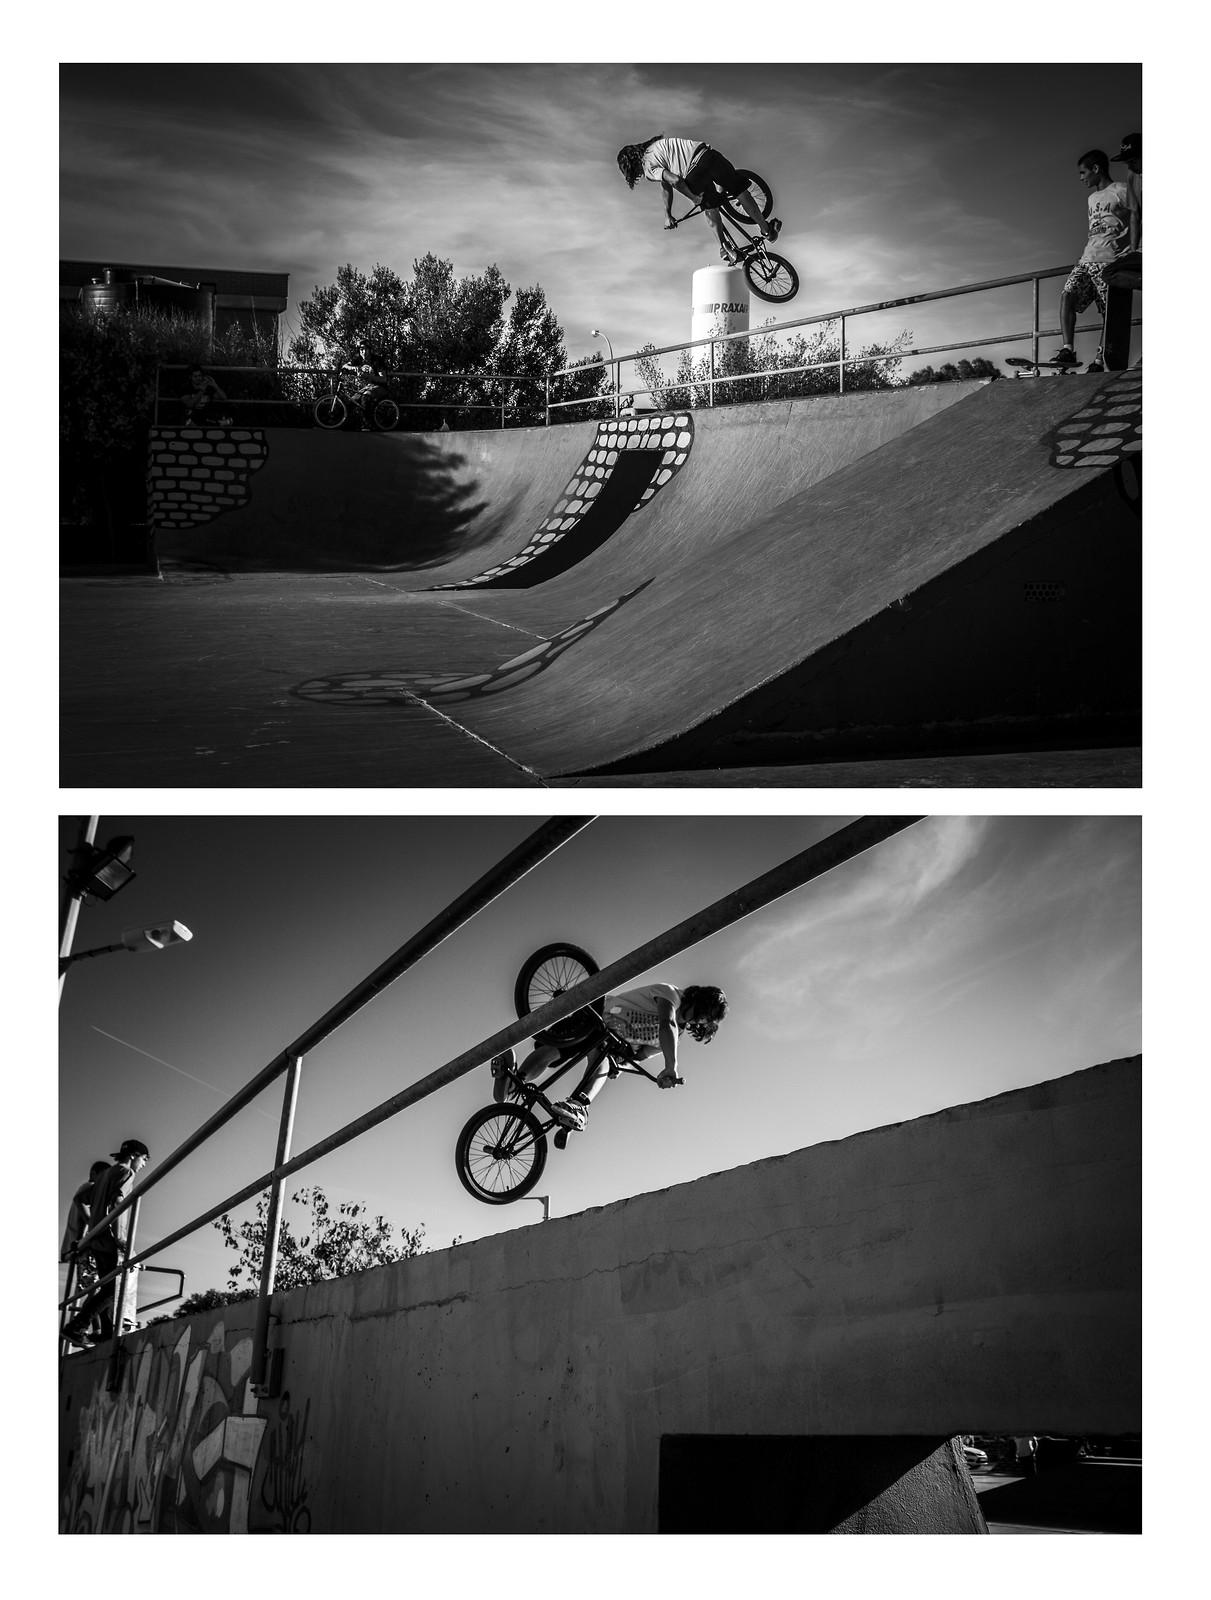 Diego Turndown - angel8bits - Mountain Biking Pictures - Vital MTB